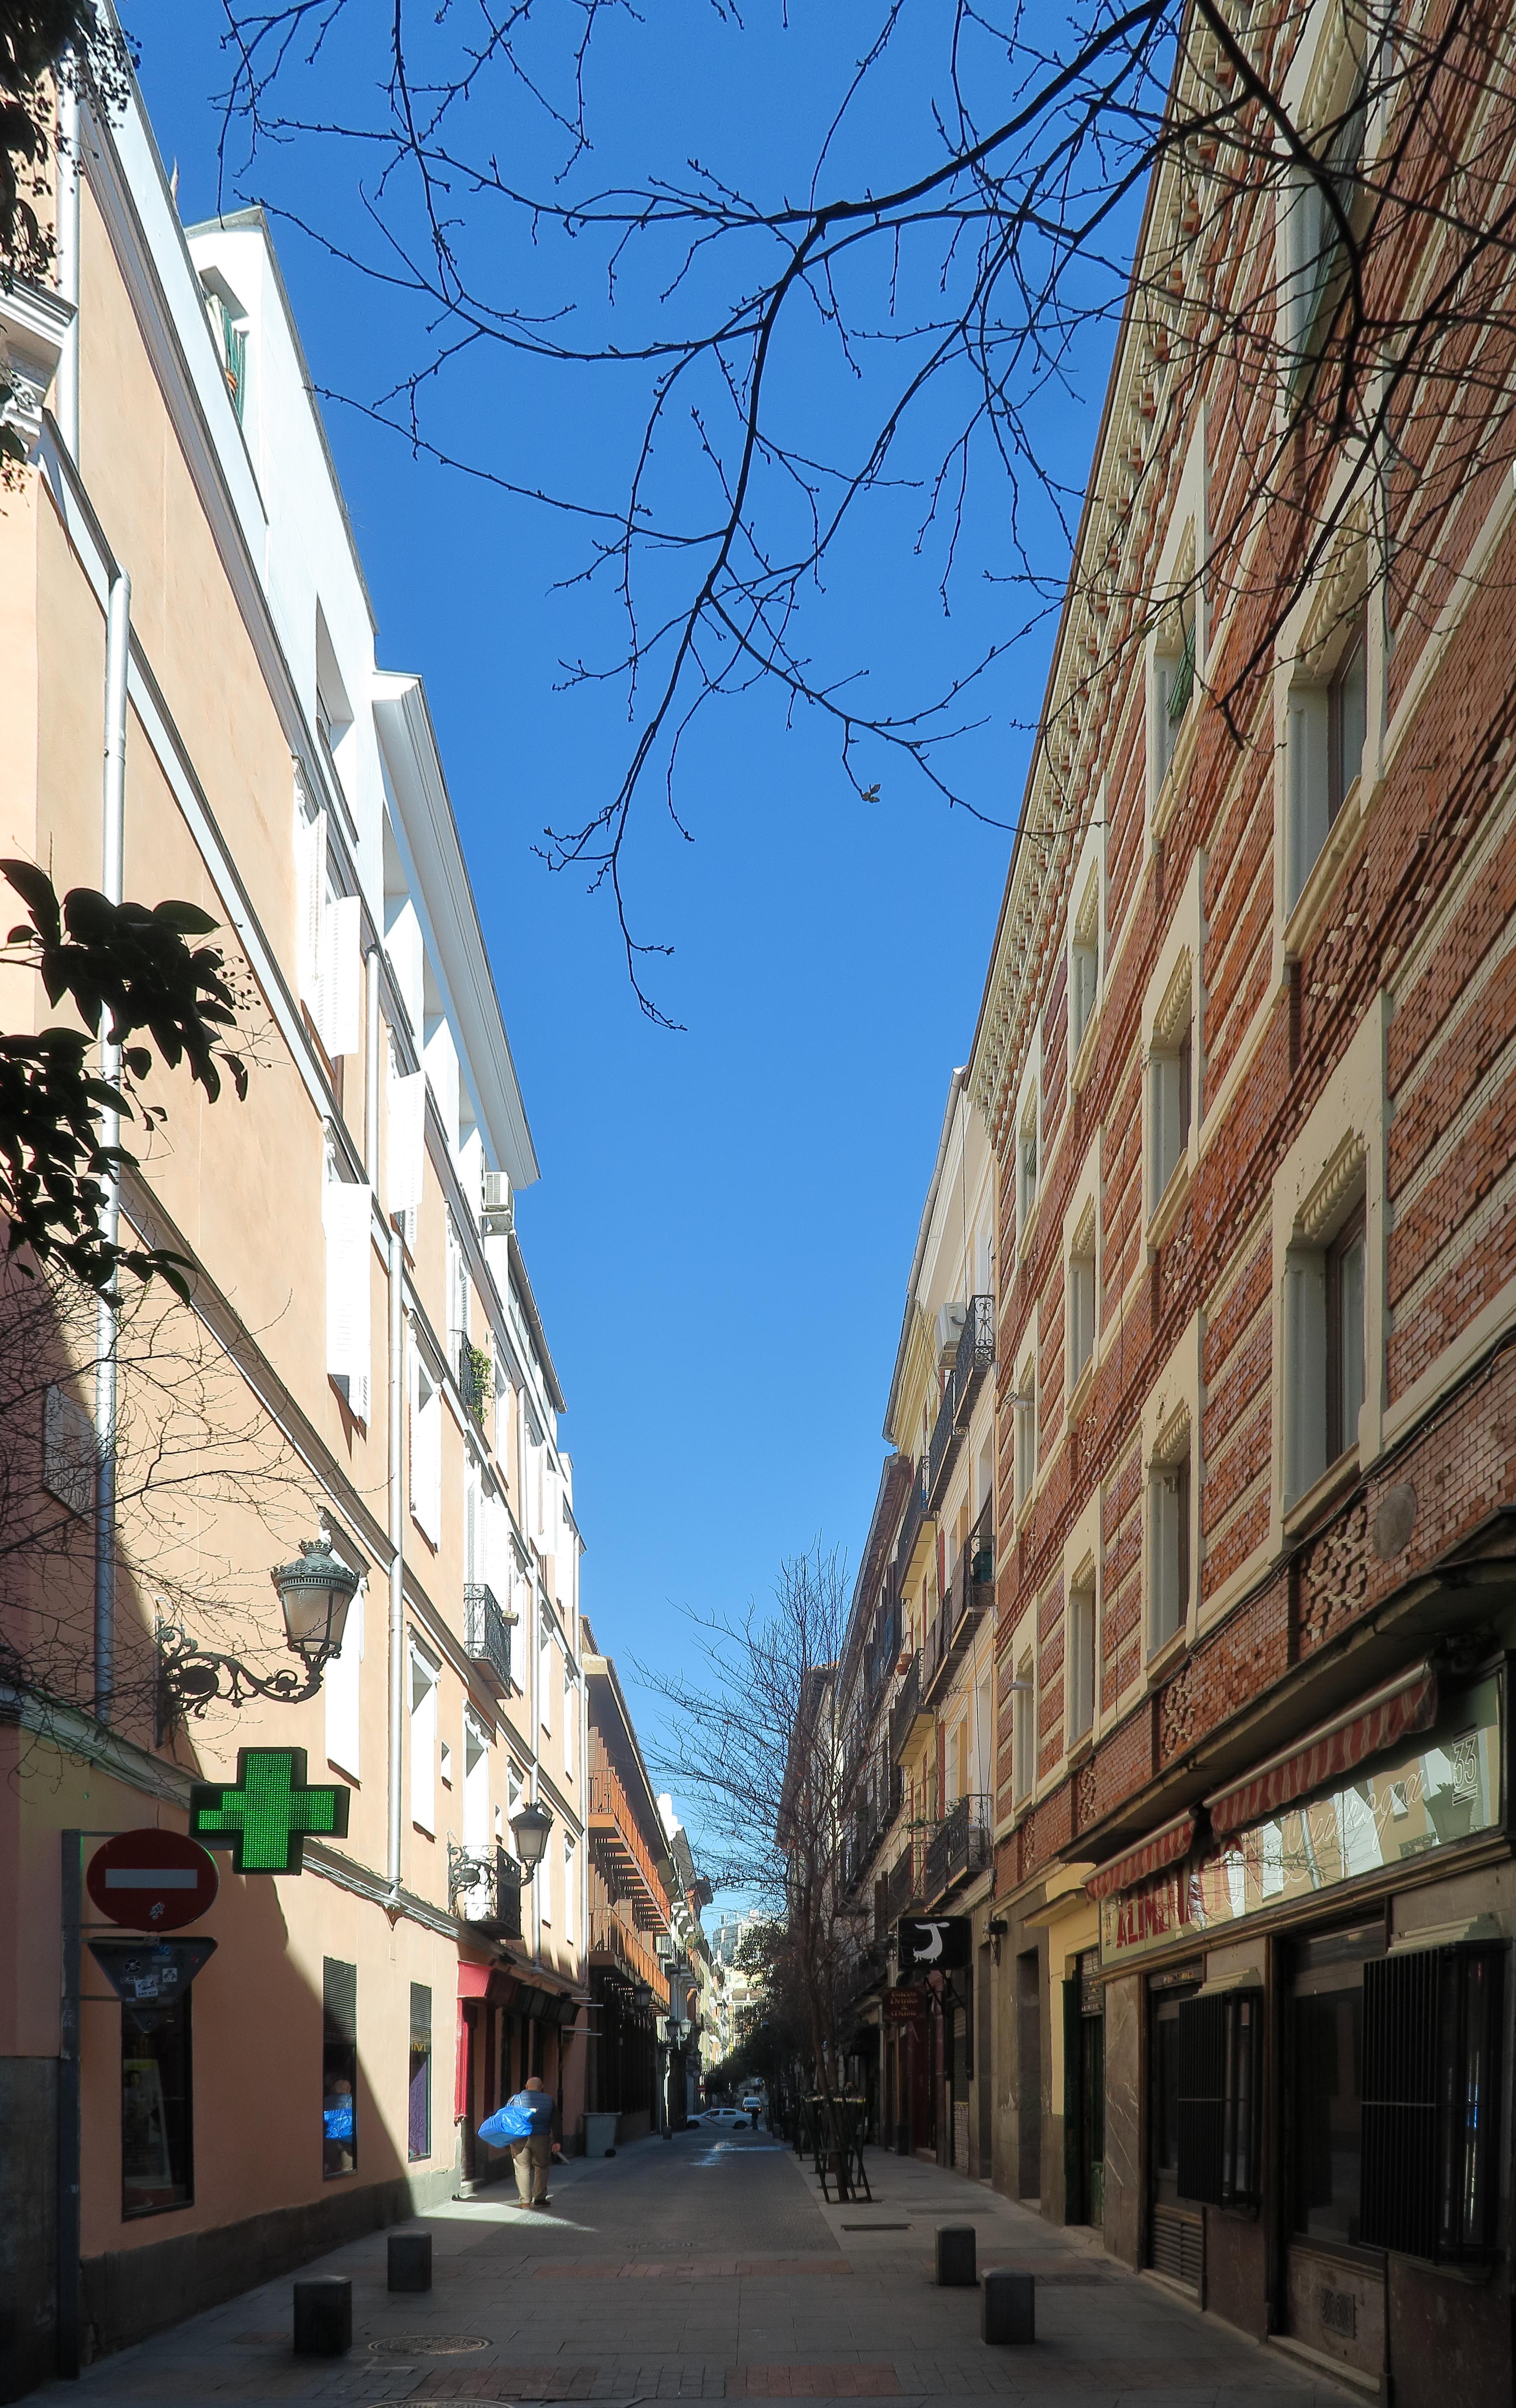 file calle de echegaray desde la calle